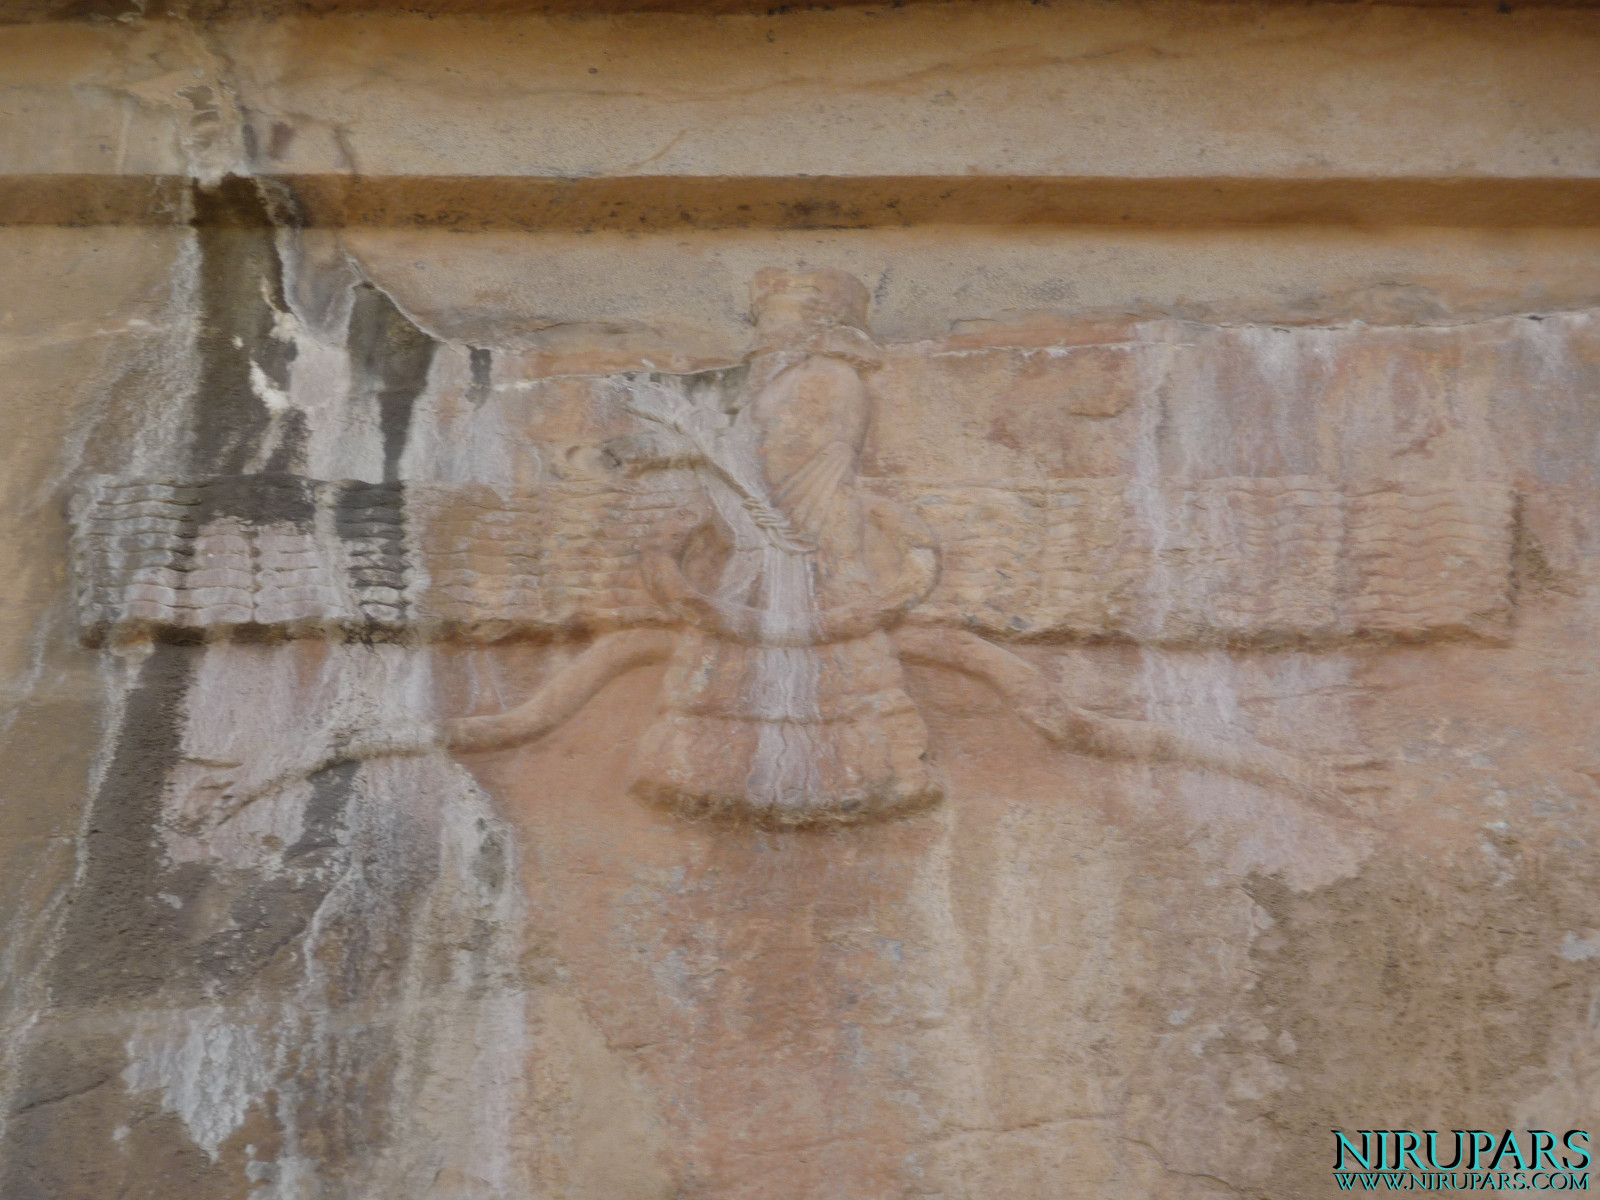 Persepolis - Tomb 1 - Relief Faravahar